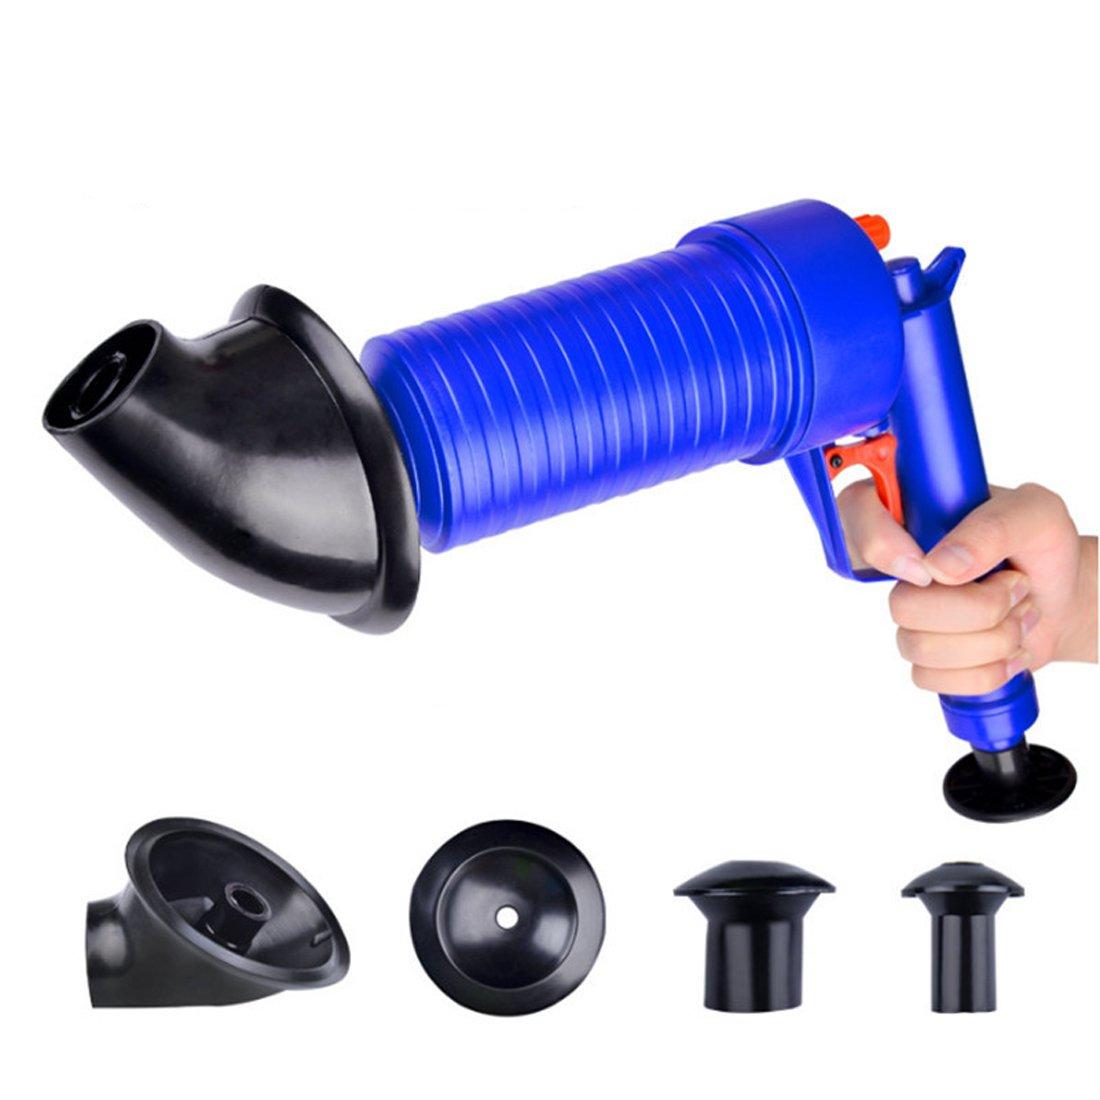 High Pressure Air Power Drain Blaster gun,PERTTY Cleaner Unclogs Toilet Pump Hand Powered Plunger Set for Bath Toilets, Bathroom, Shower, kitchen Clogged Pipe Bathtub(Blue) by PERTTY (Image #3)